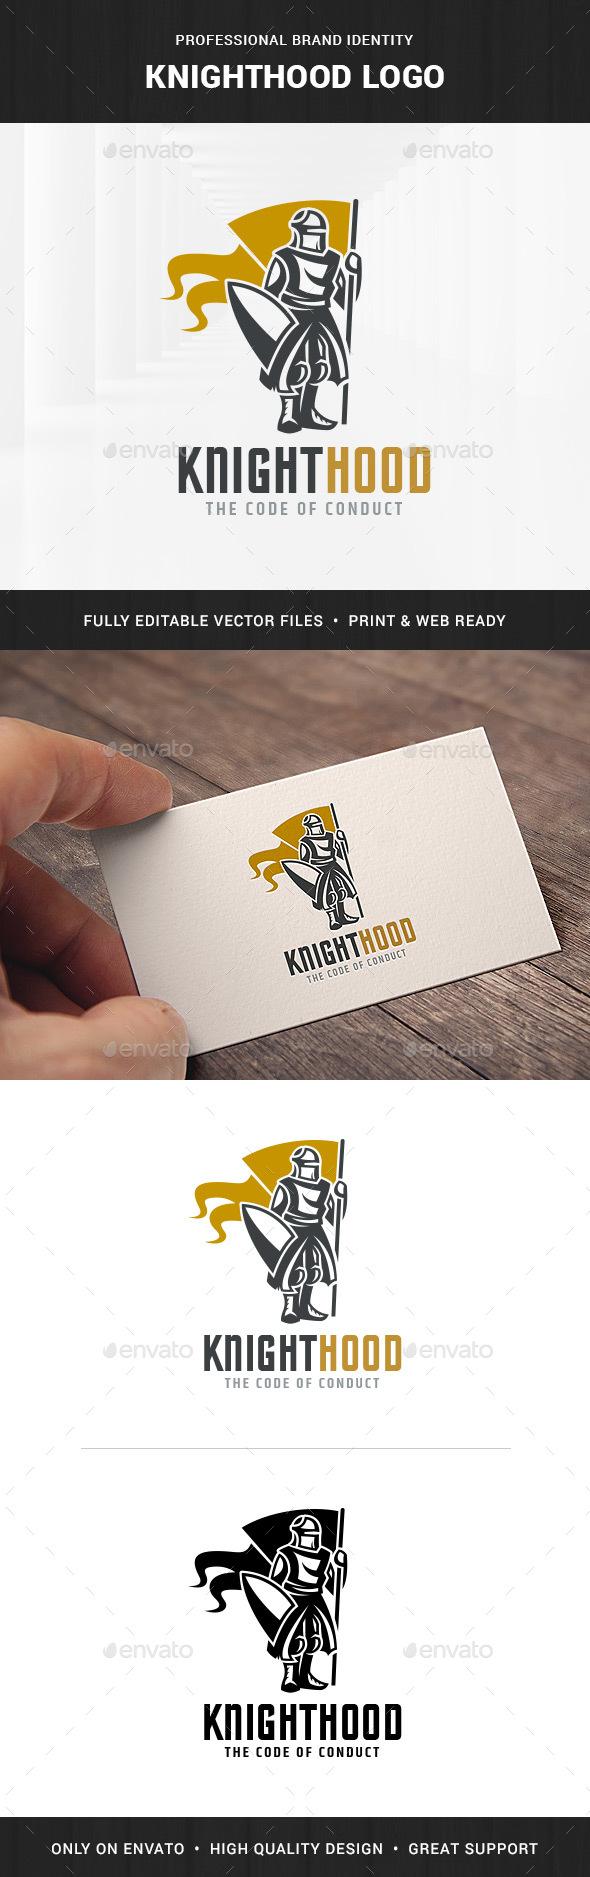 Knighthood Logo Template